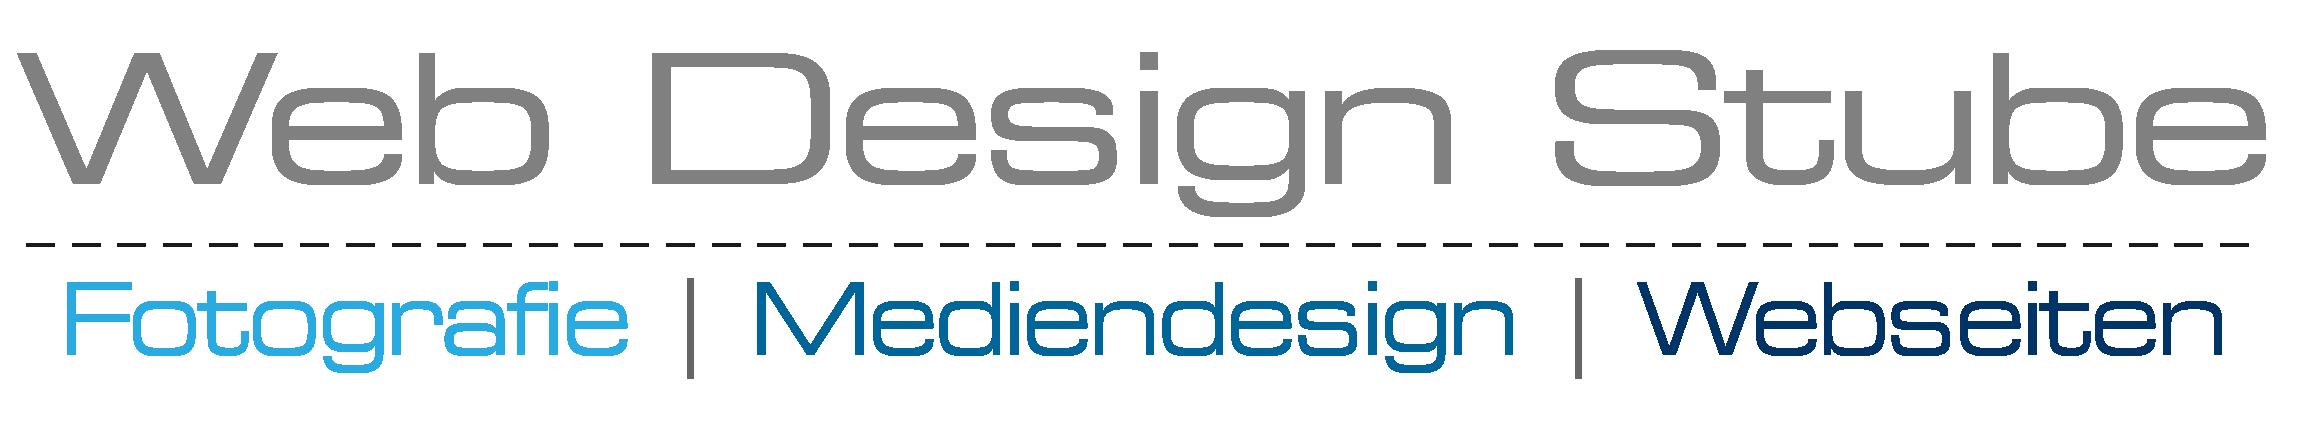 WEB DESIGN STUBE | Fotografie | Fotostudio | Mediengestaltung | Flyer | Webdesign| Fichtelgebirge | Bayern